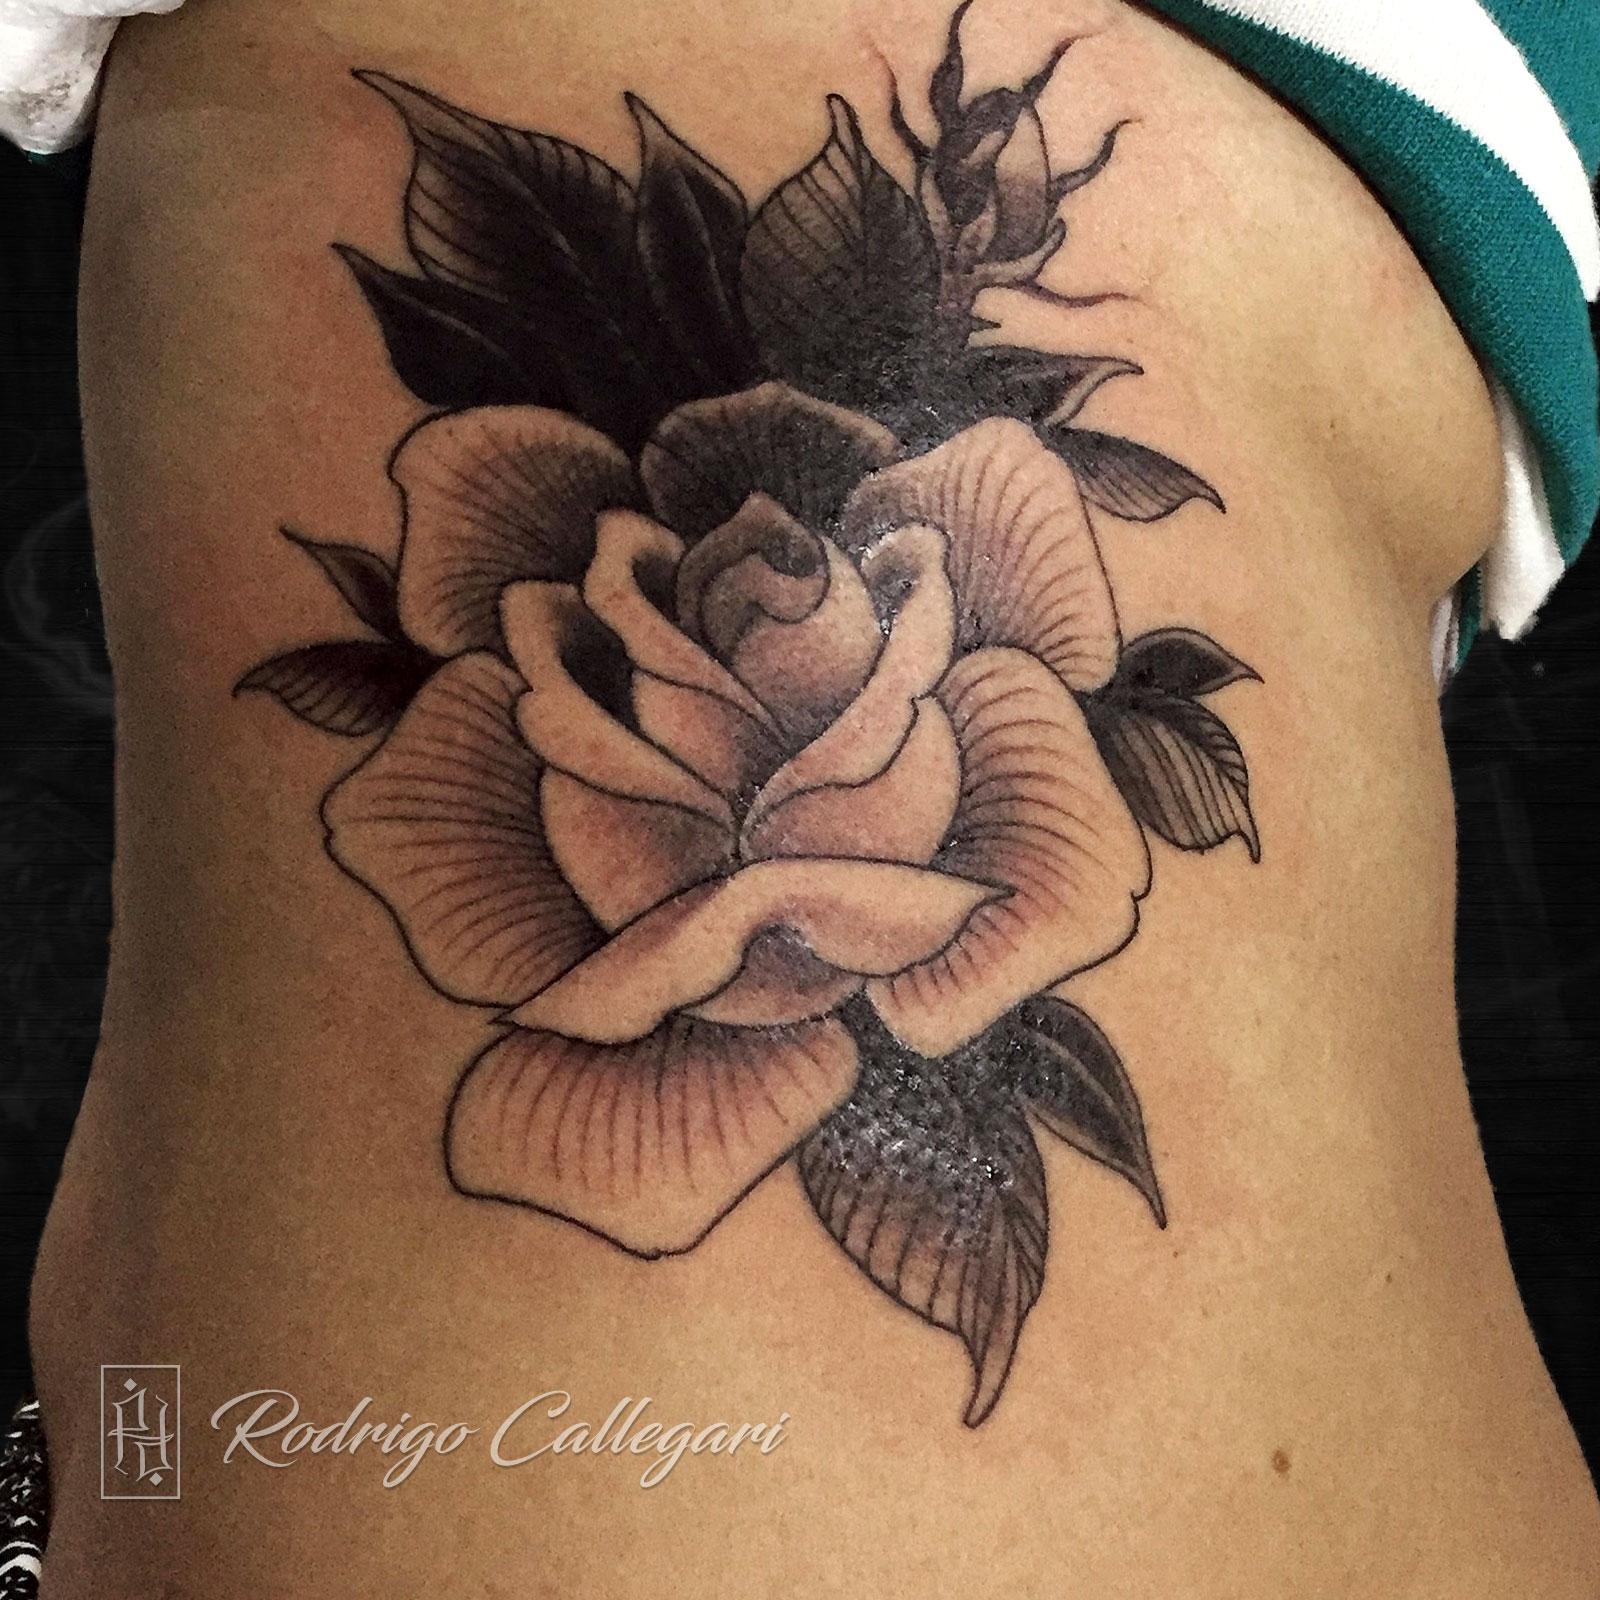 rodrigo-callegari-tattoo-other-23